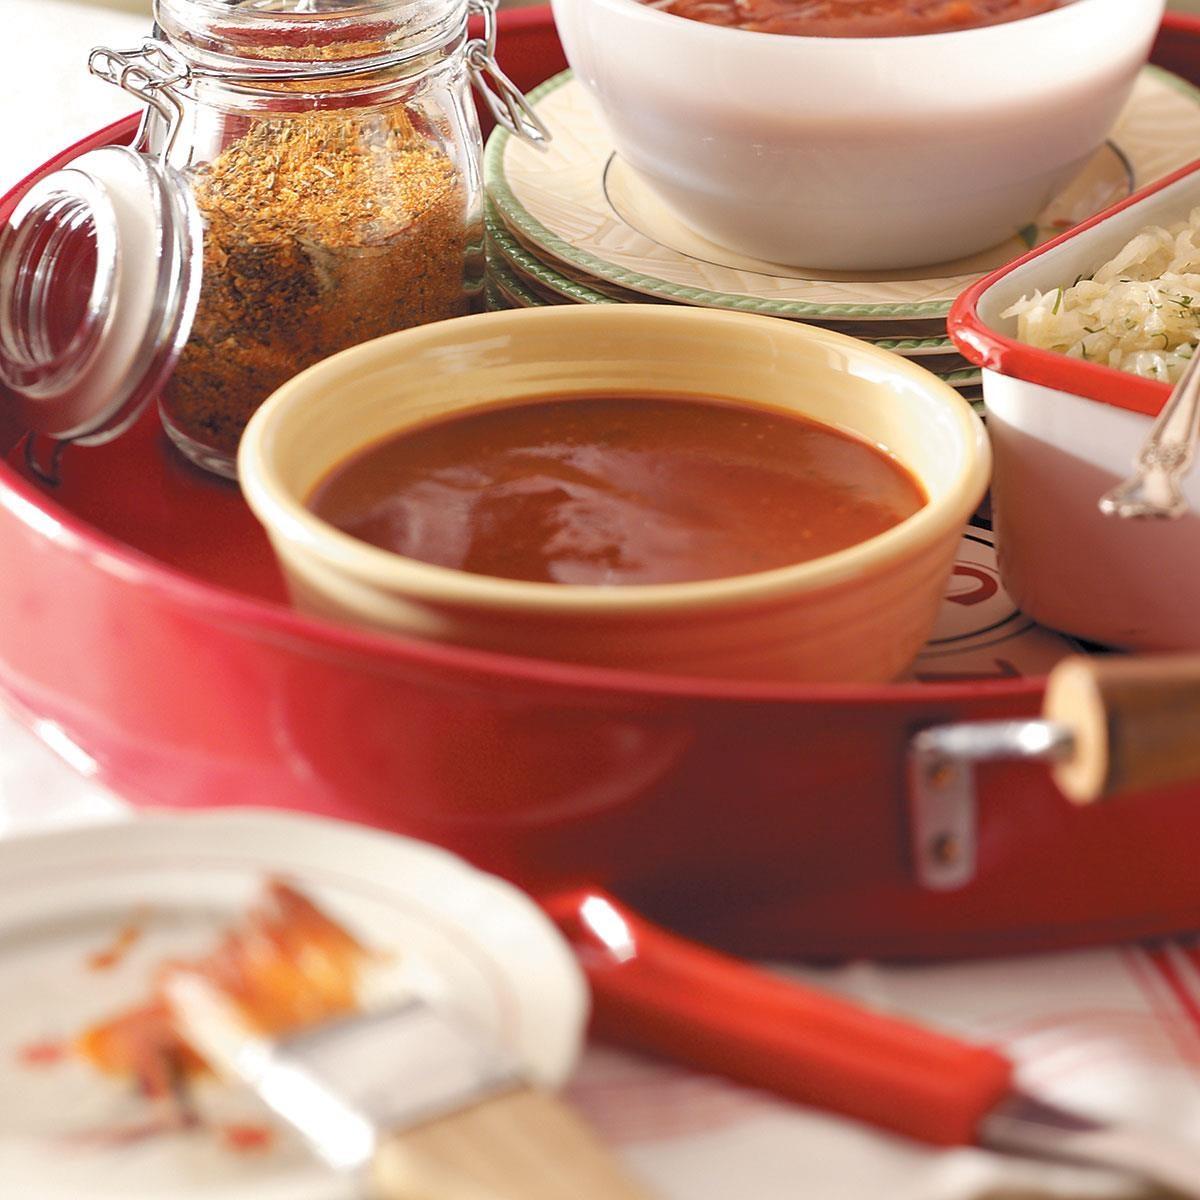 Honey bbq sauce recipes easy